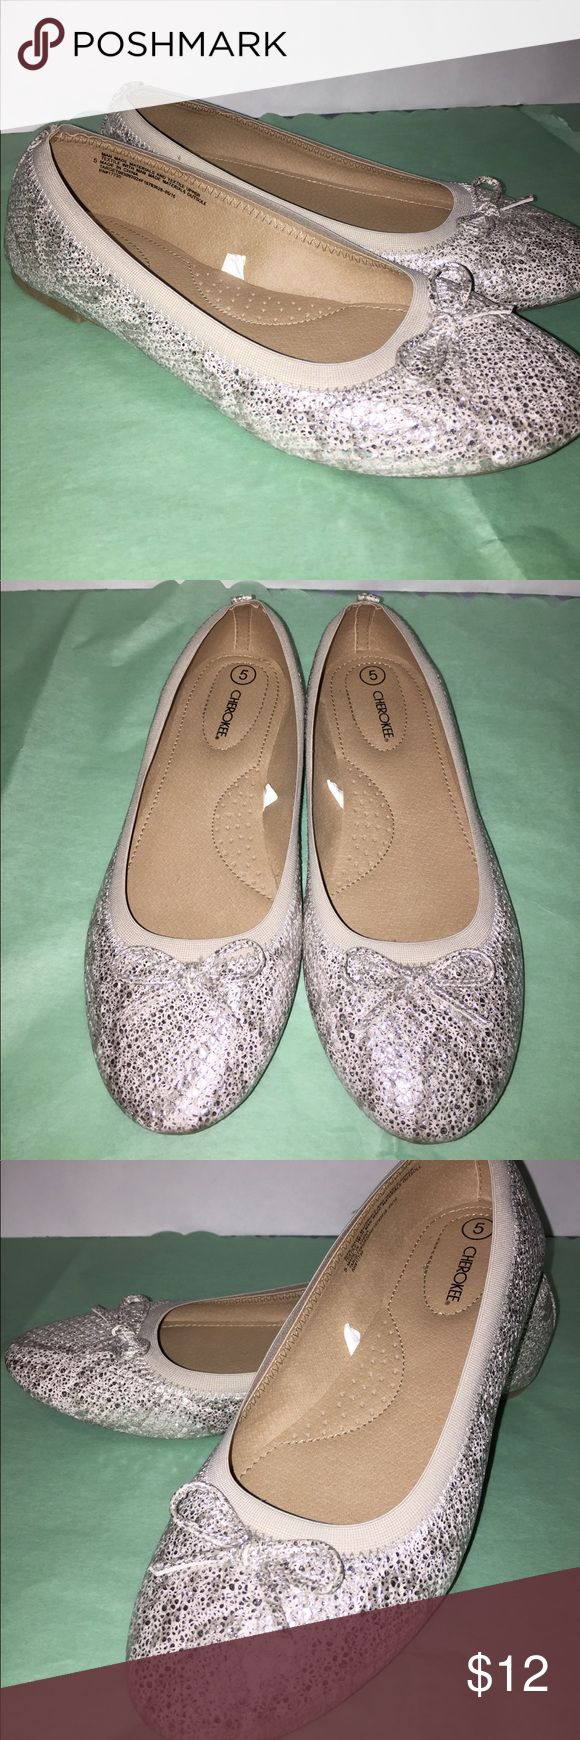 Girls ballet flats size 5 Worn once. Cherokee (Target) Big girls size 5 Ballet flats. Metallic snakeskin look with bows. Cherokee Shoes Dress Shoes